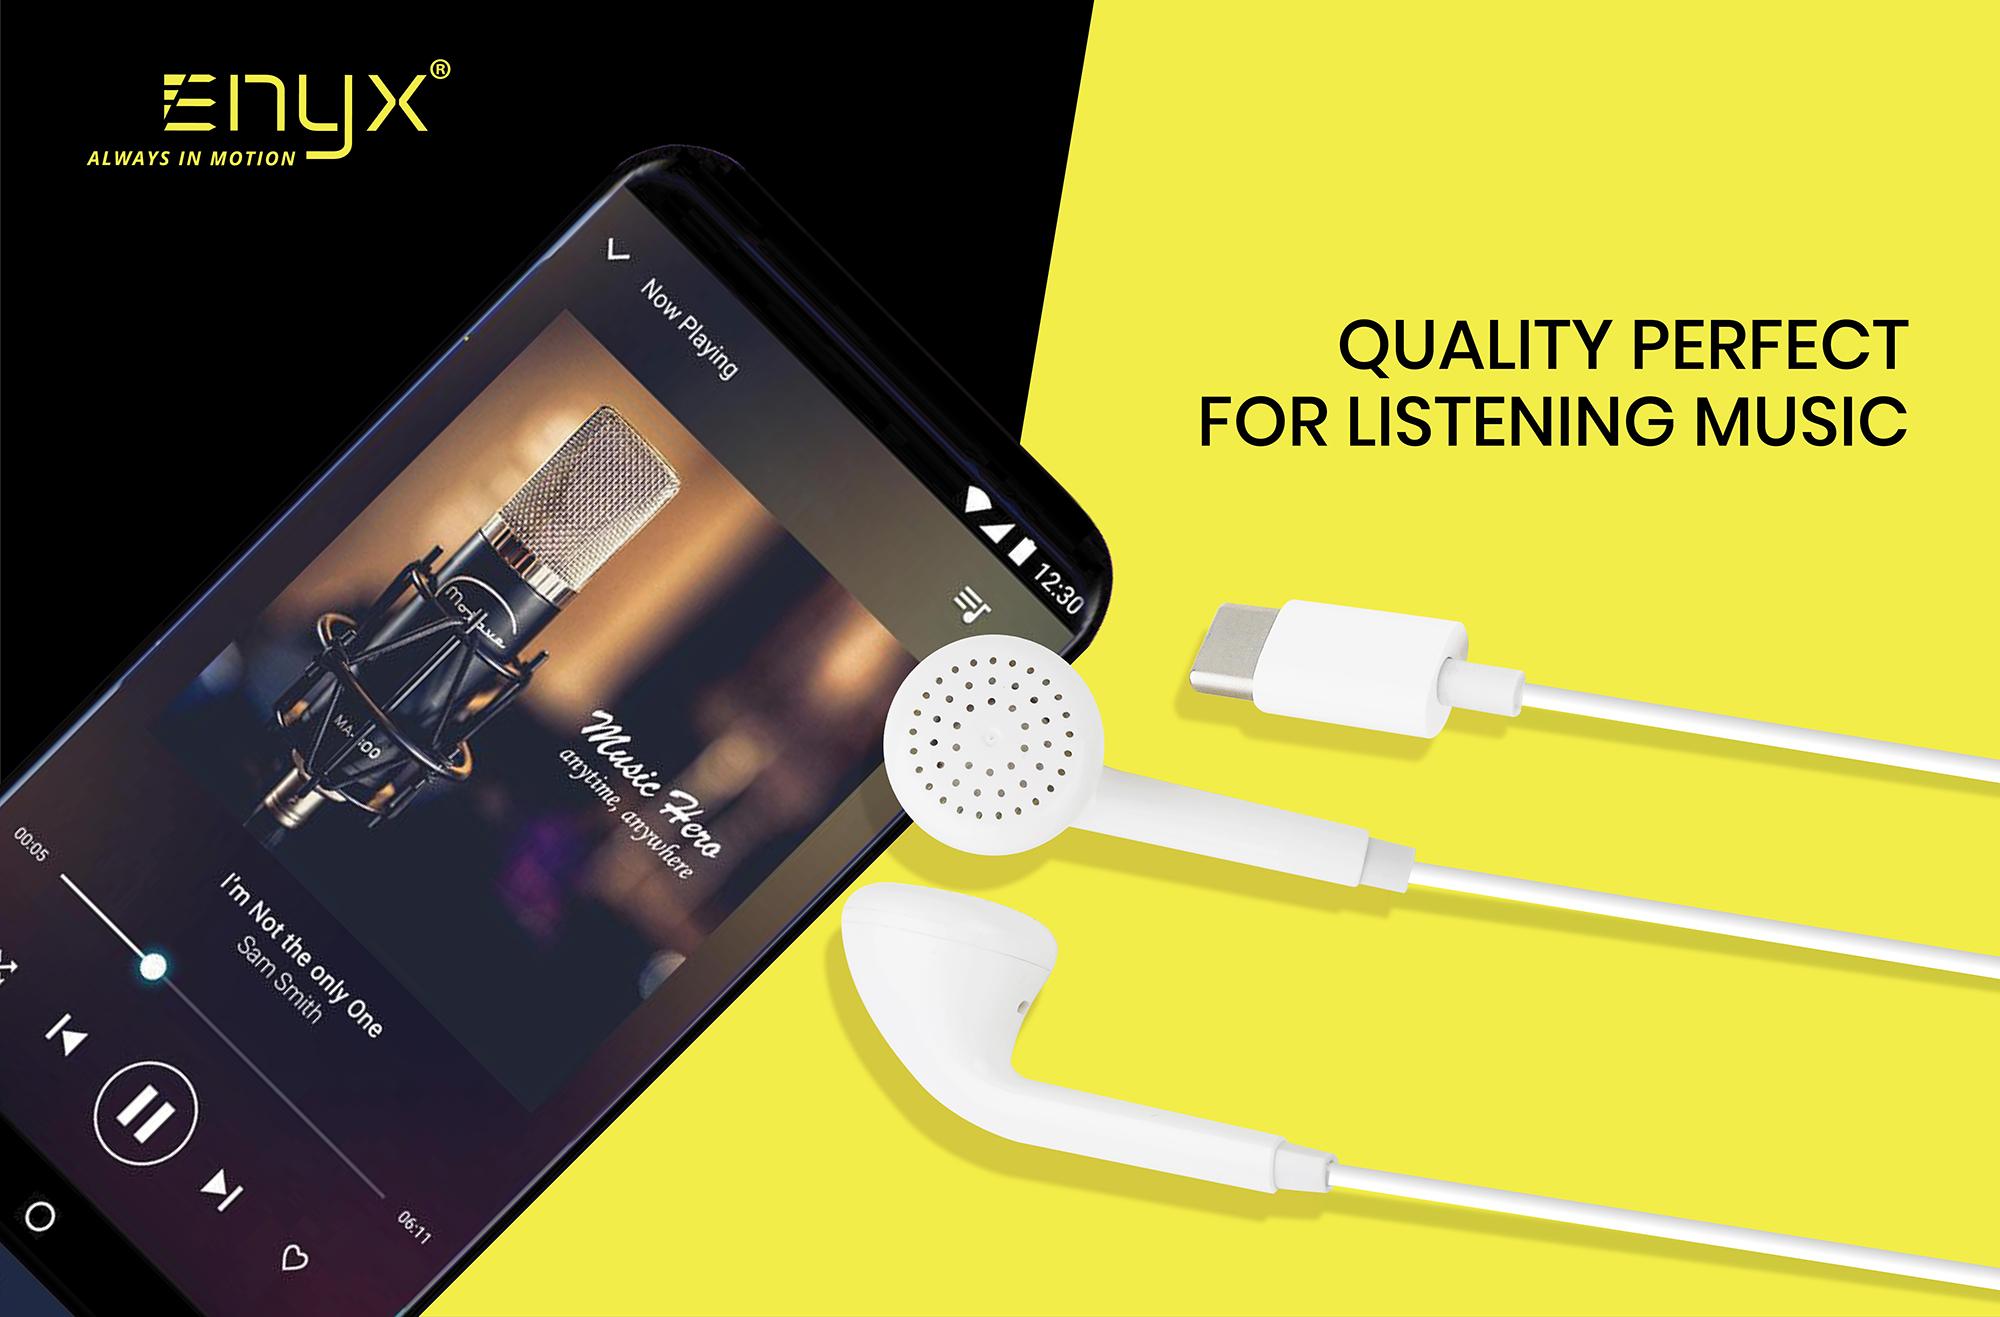 EE05 หูฟัง Type-C Earphone อินิกซ์ Enyx